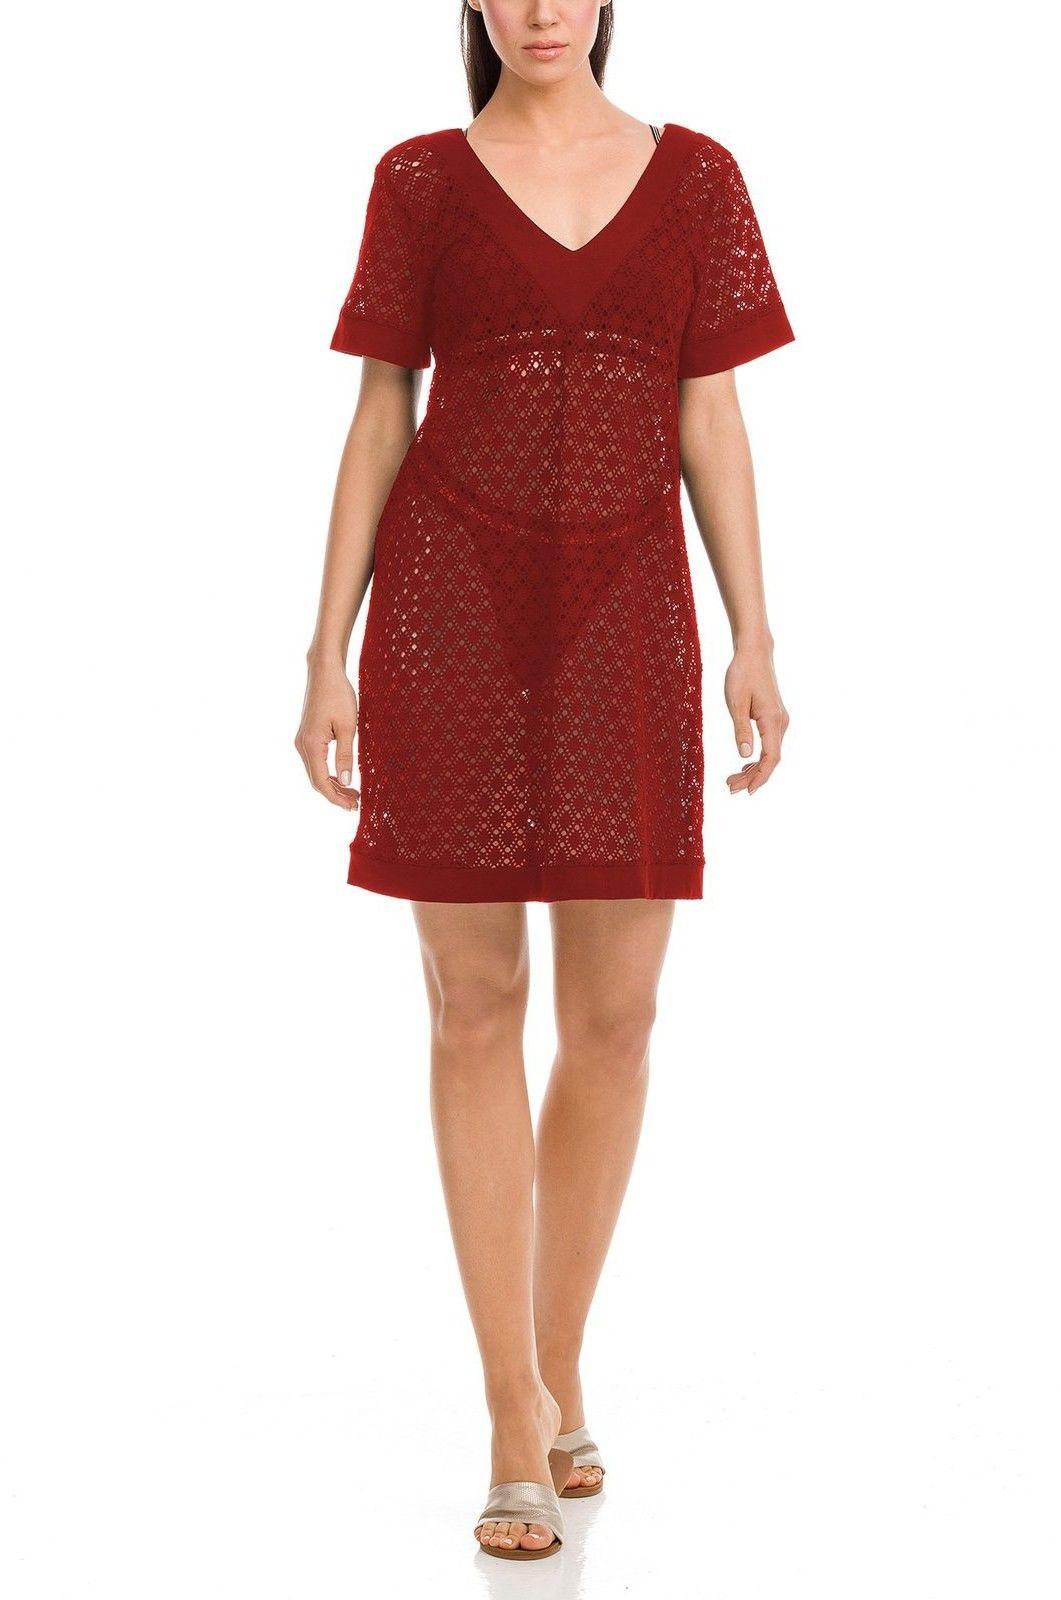 Sukienka plażowa Vamp Narcissa 12575 kolor 489